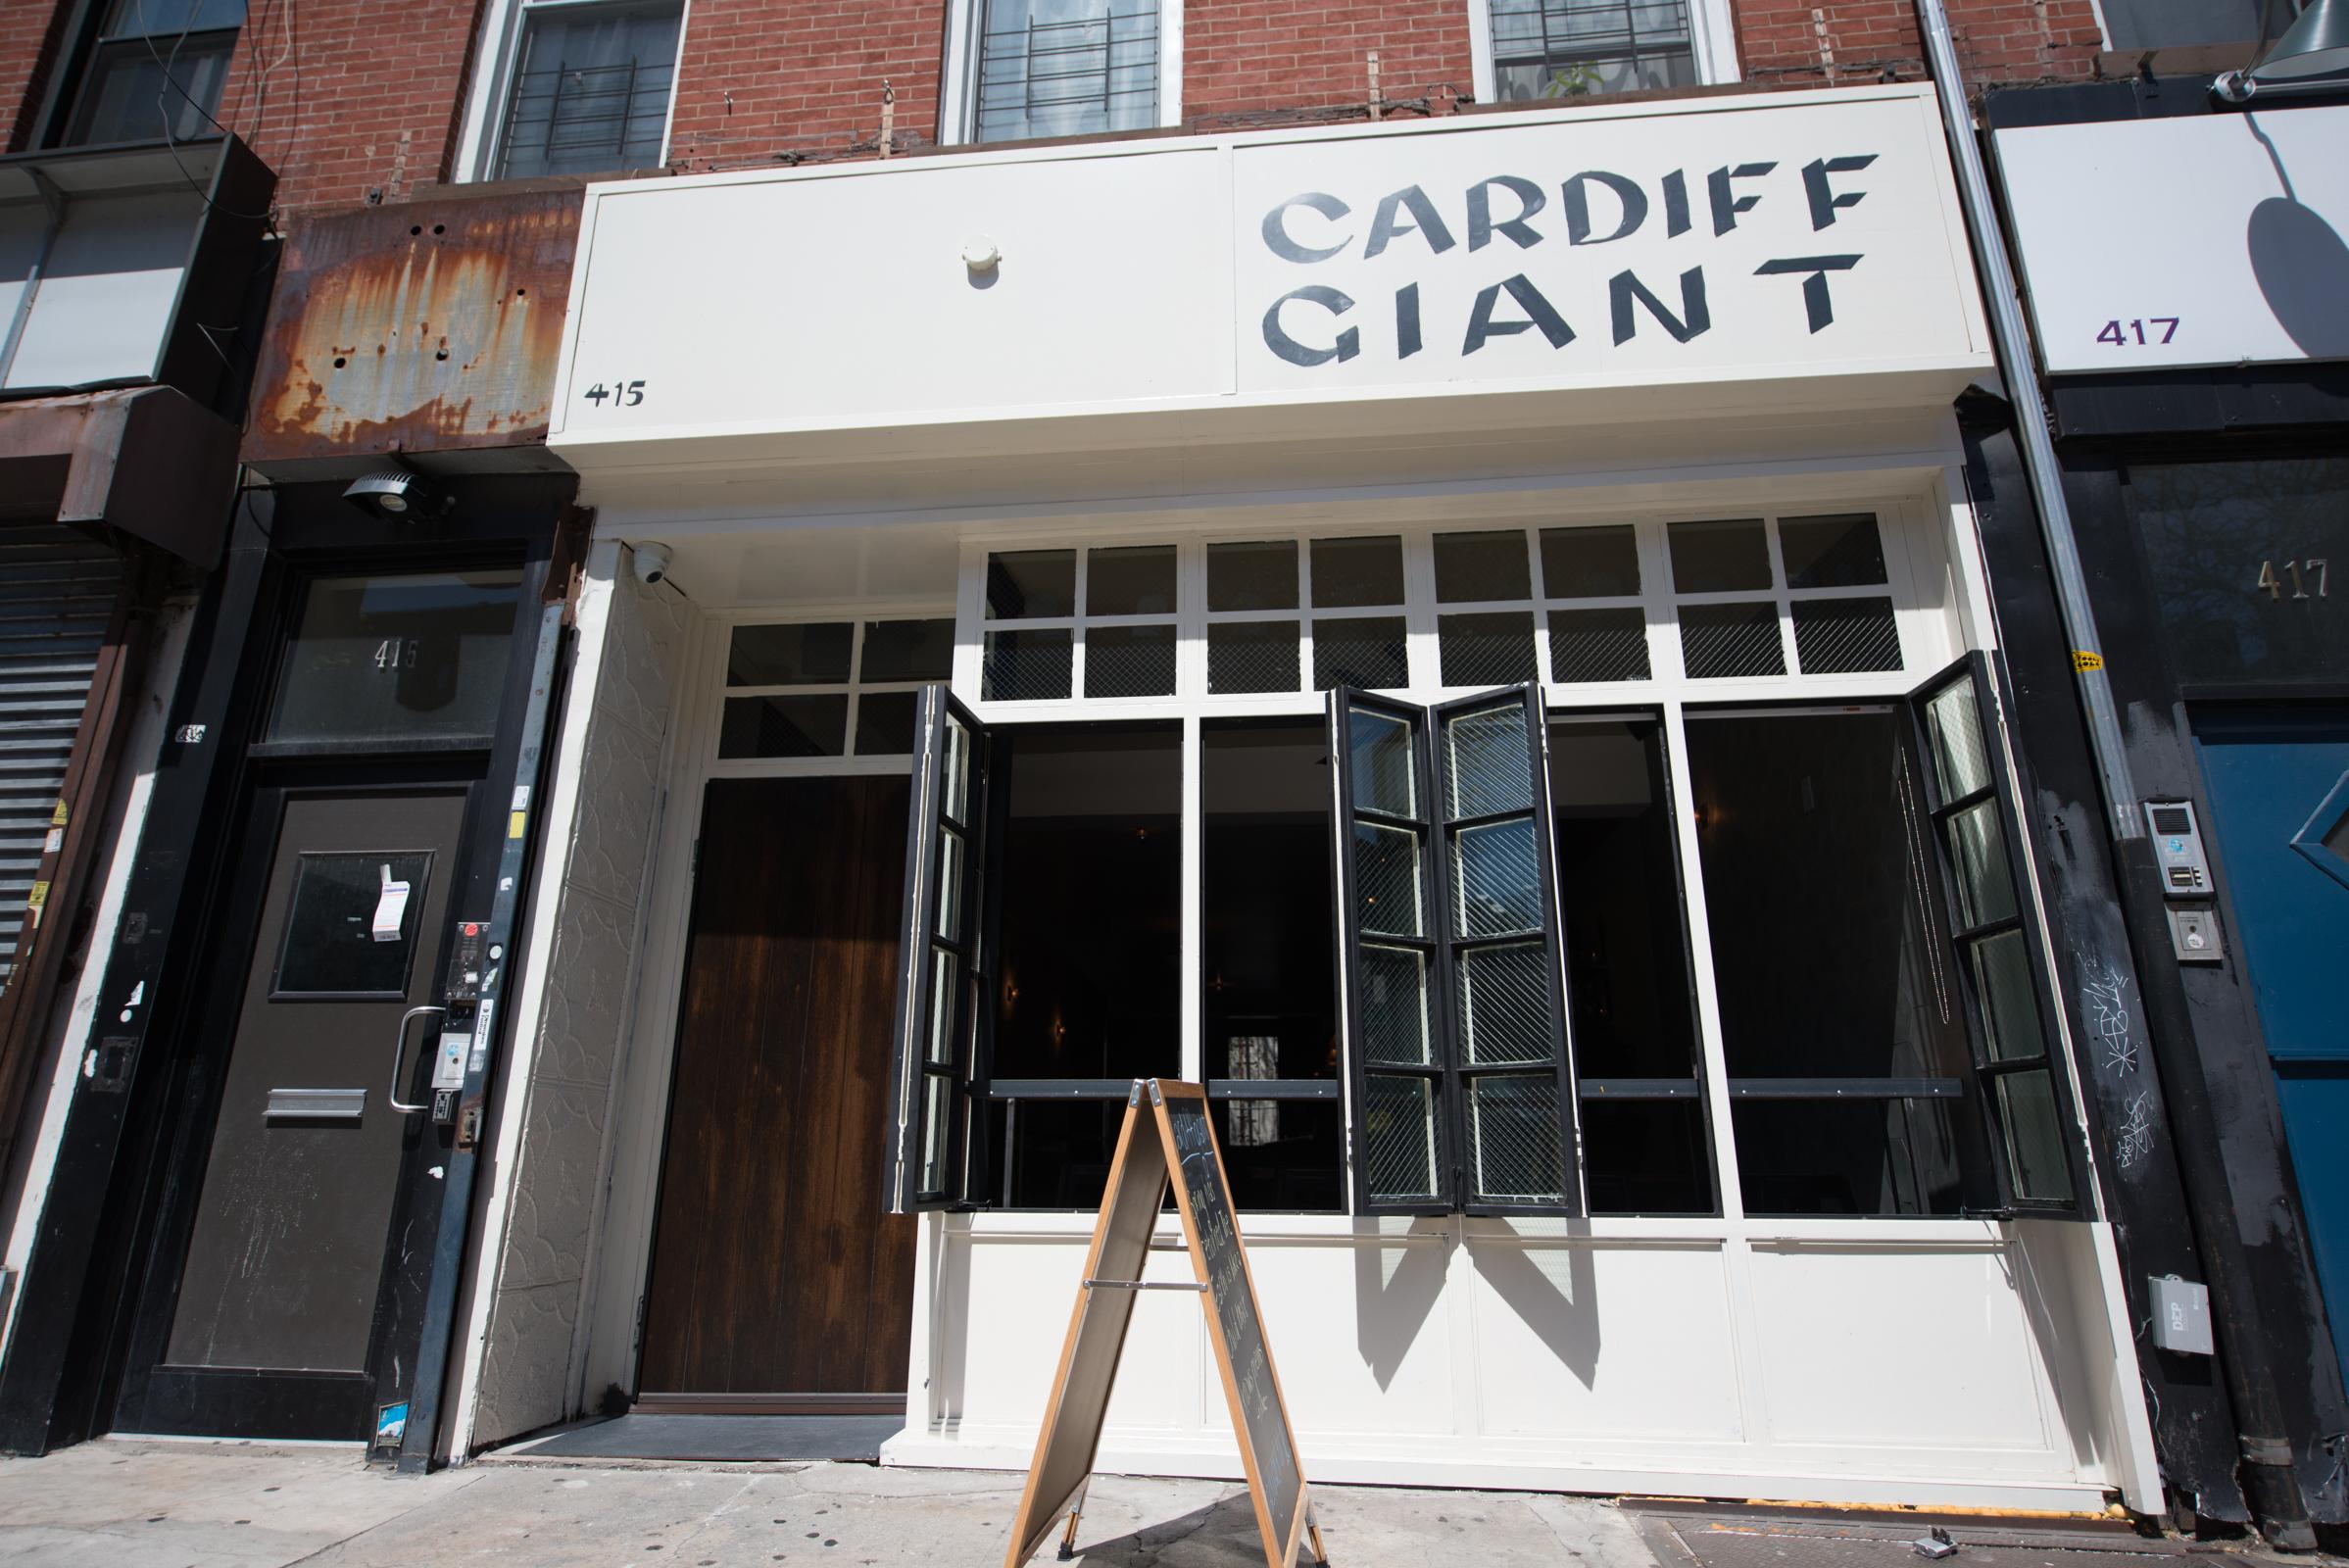 CardiffGiant_04182016-4314.jpg